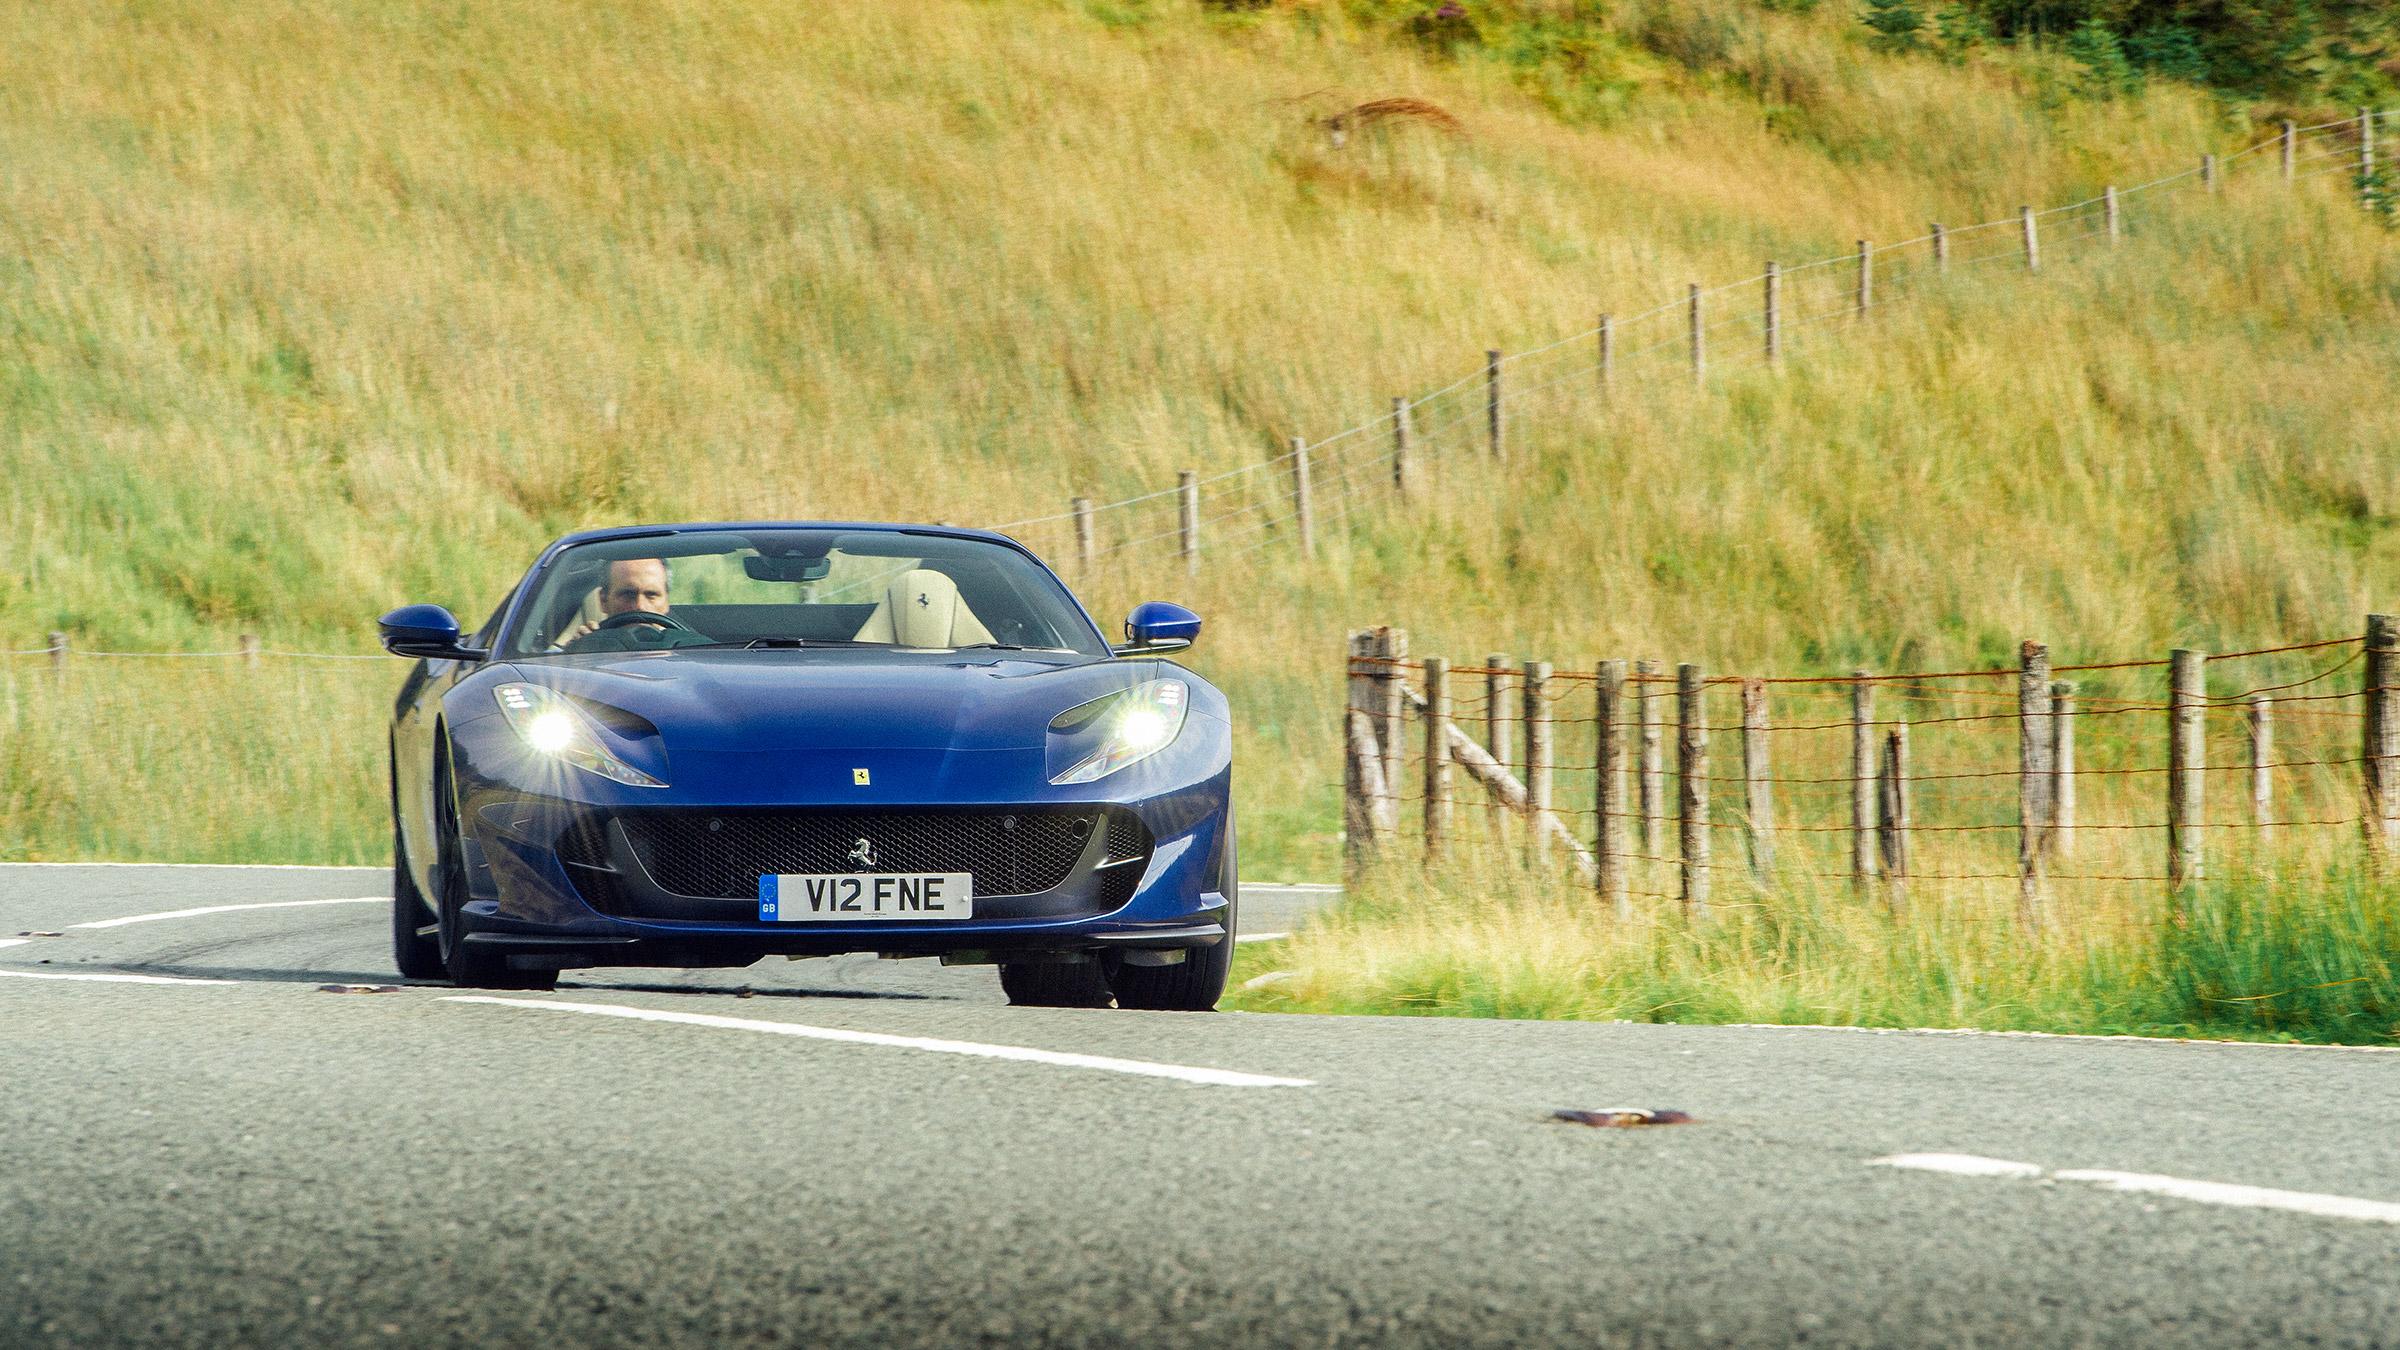 Ferrari 812 Gts 2020 Review Ultimate Open Top V12 Thrills Evo